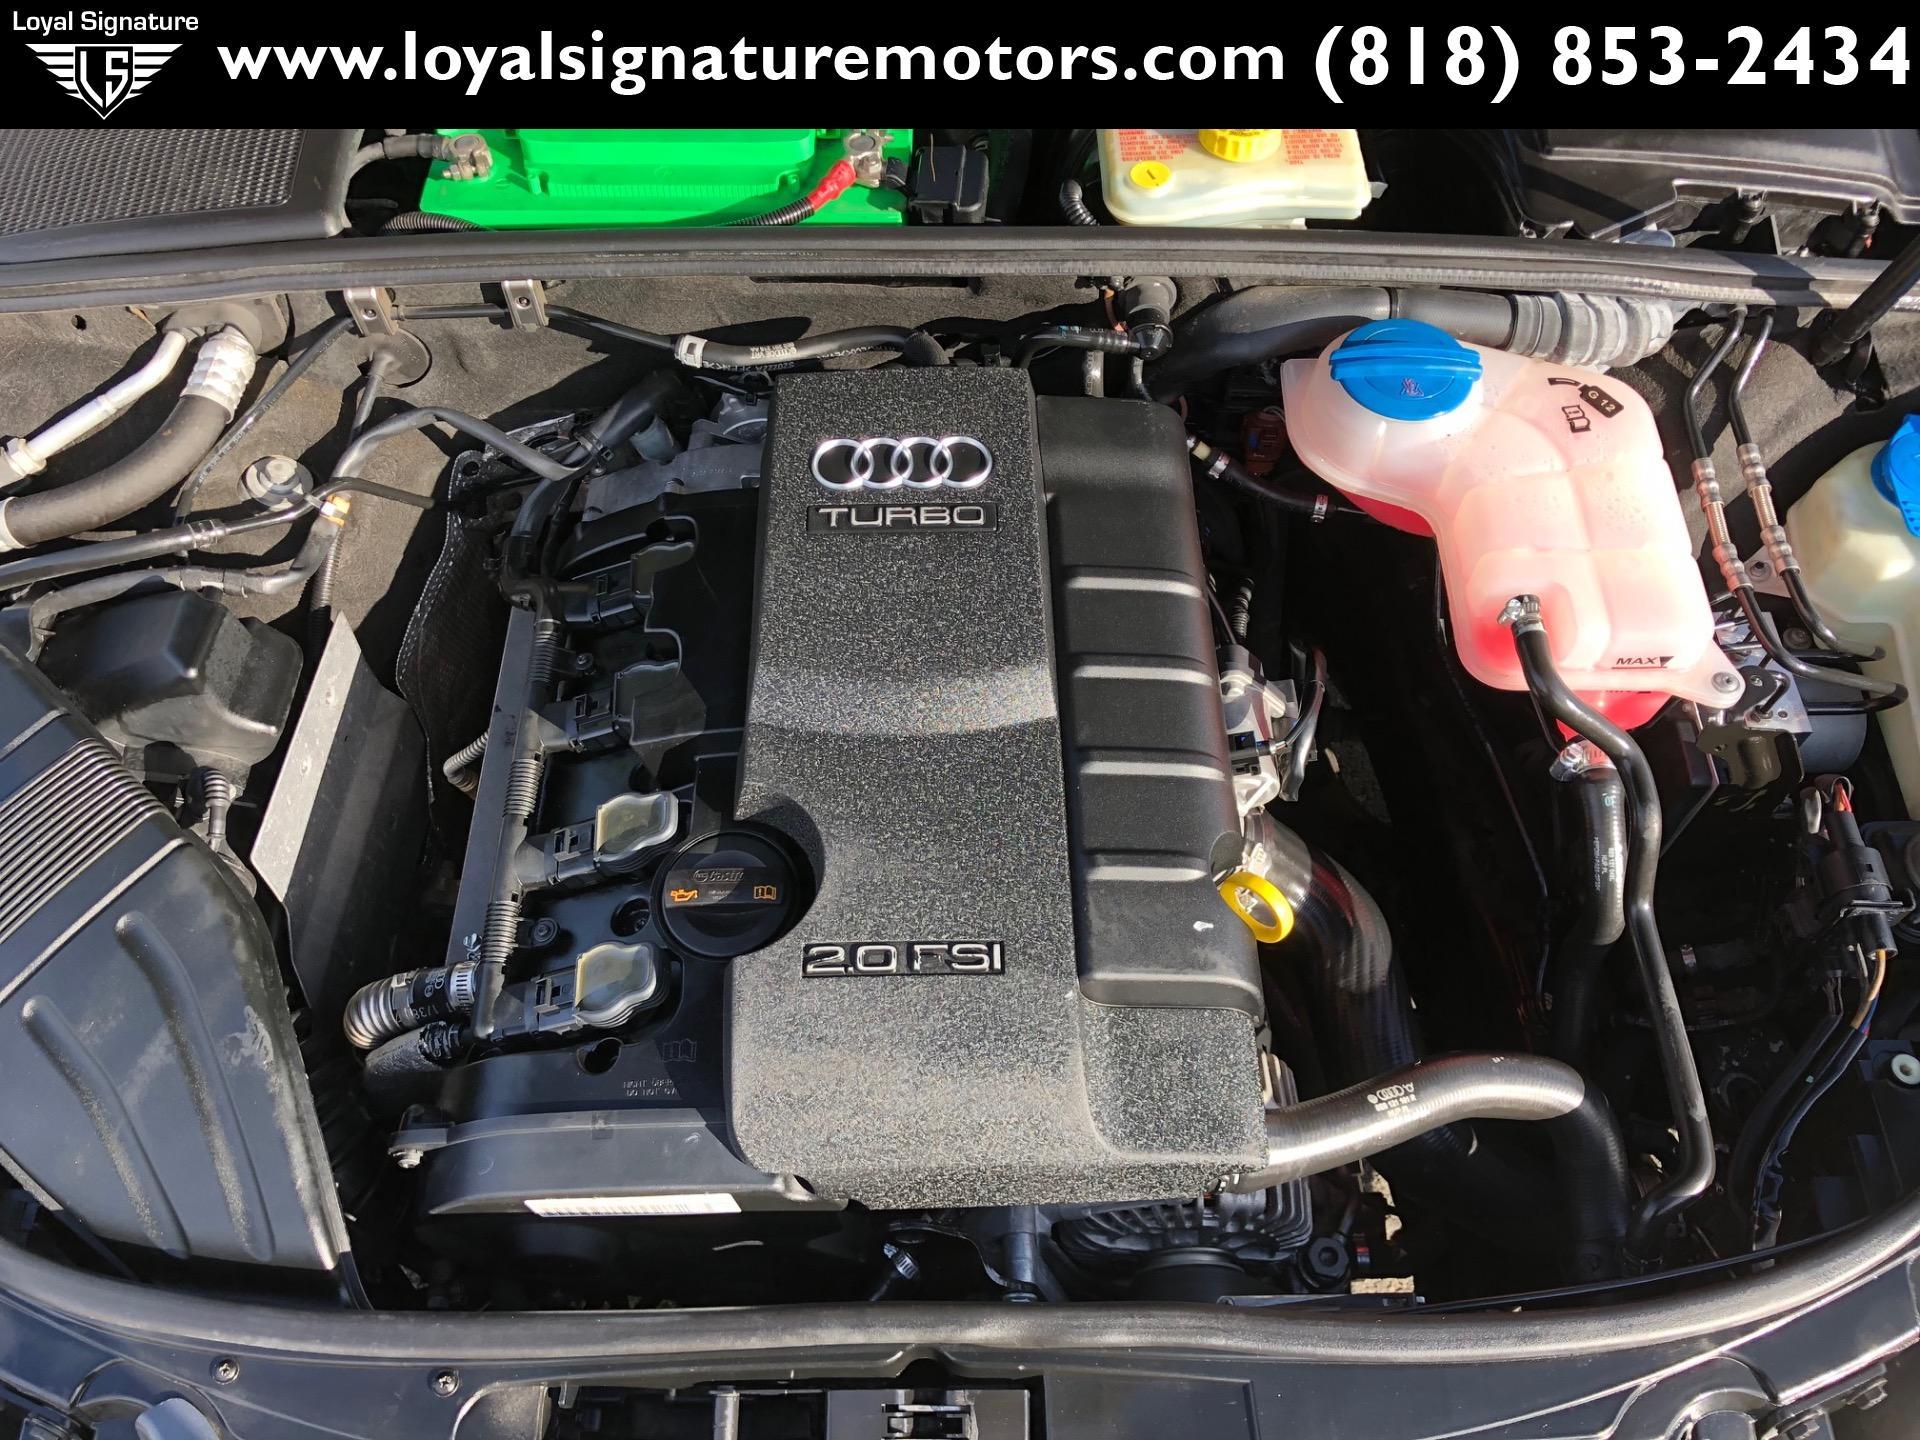 Used-2008-Audi-A4-20T